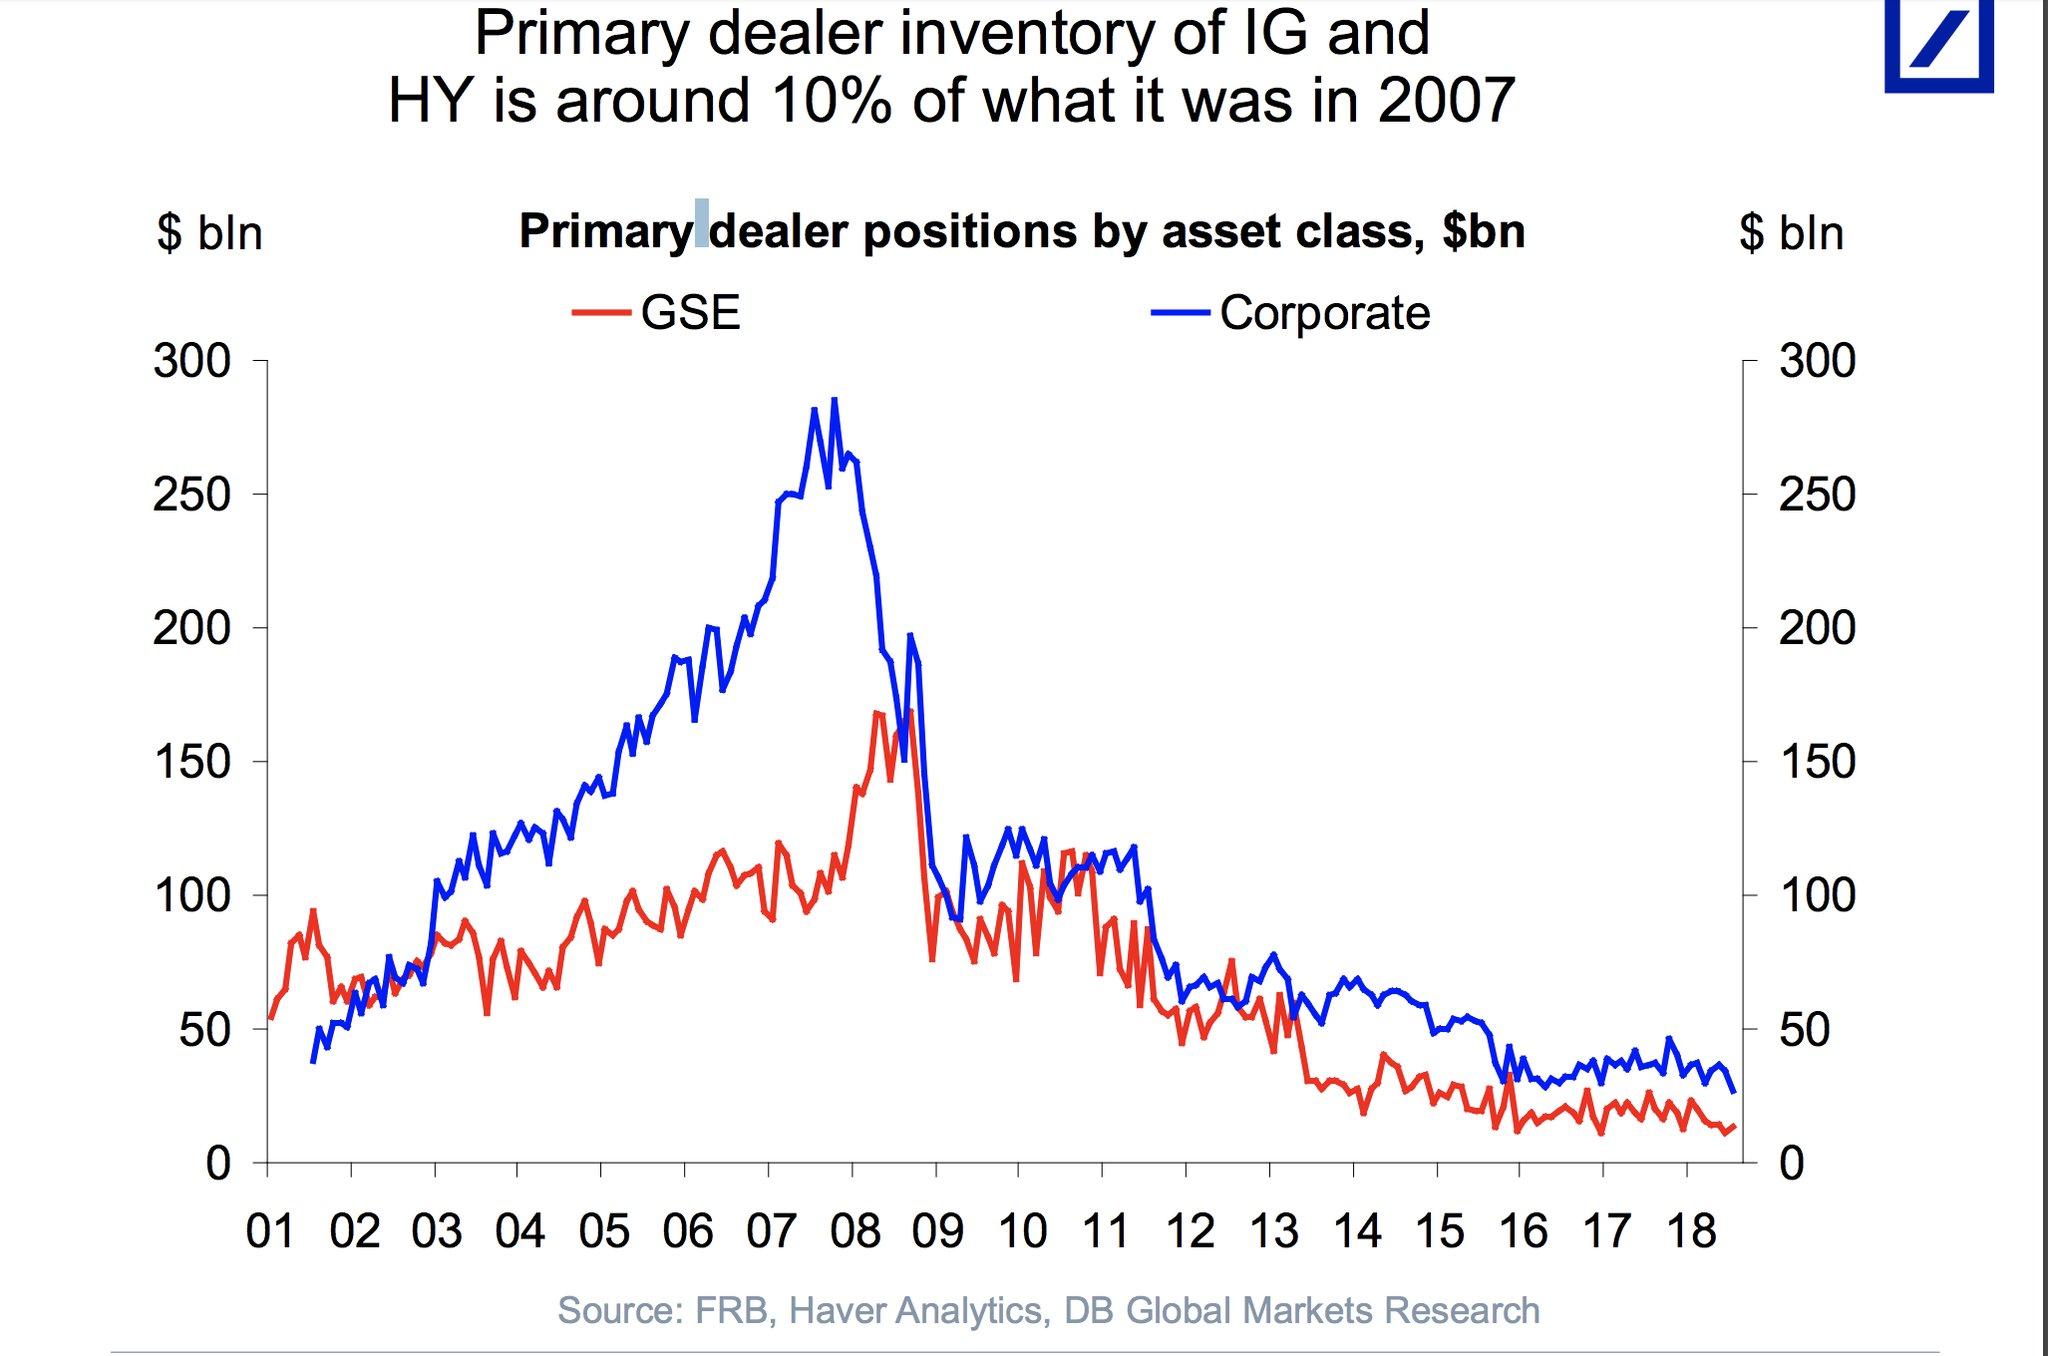 Primary dealer inventory of IG…